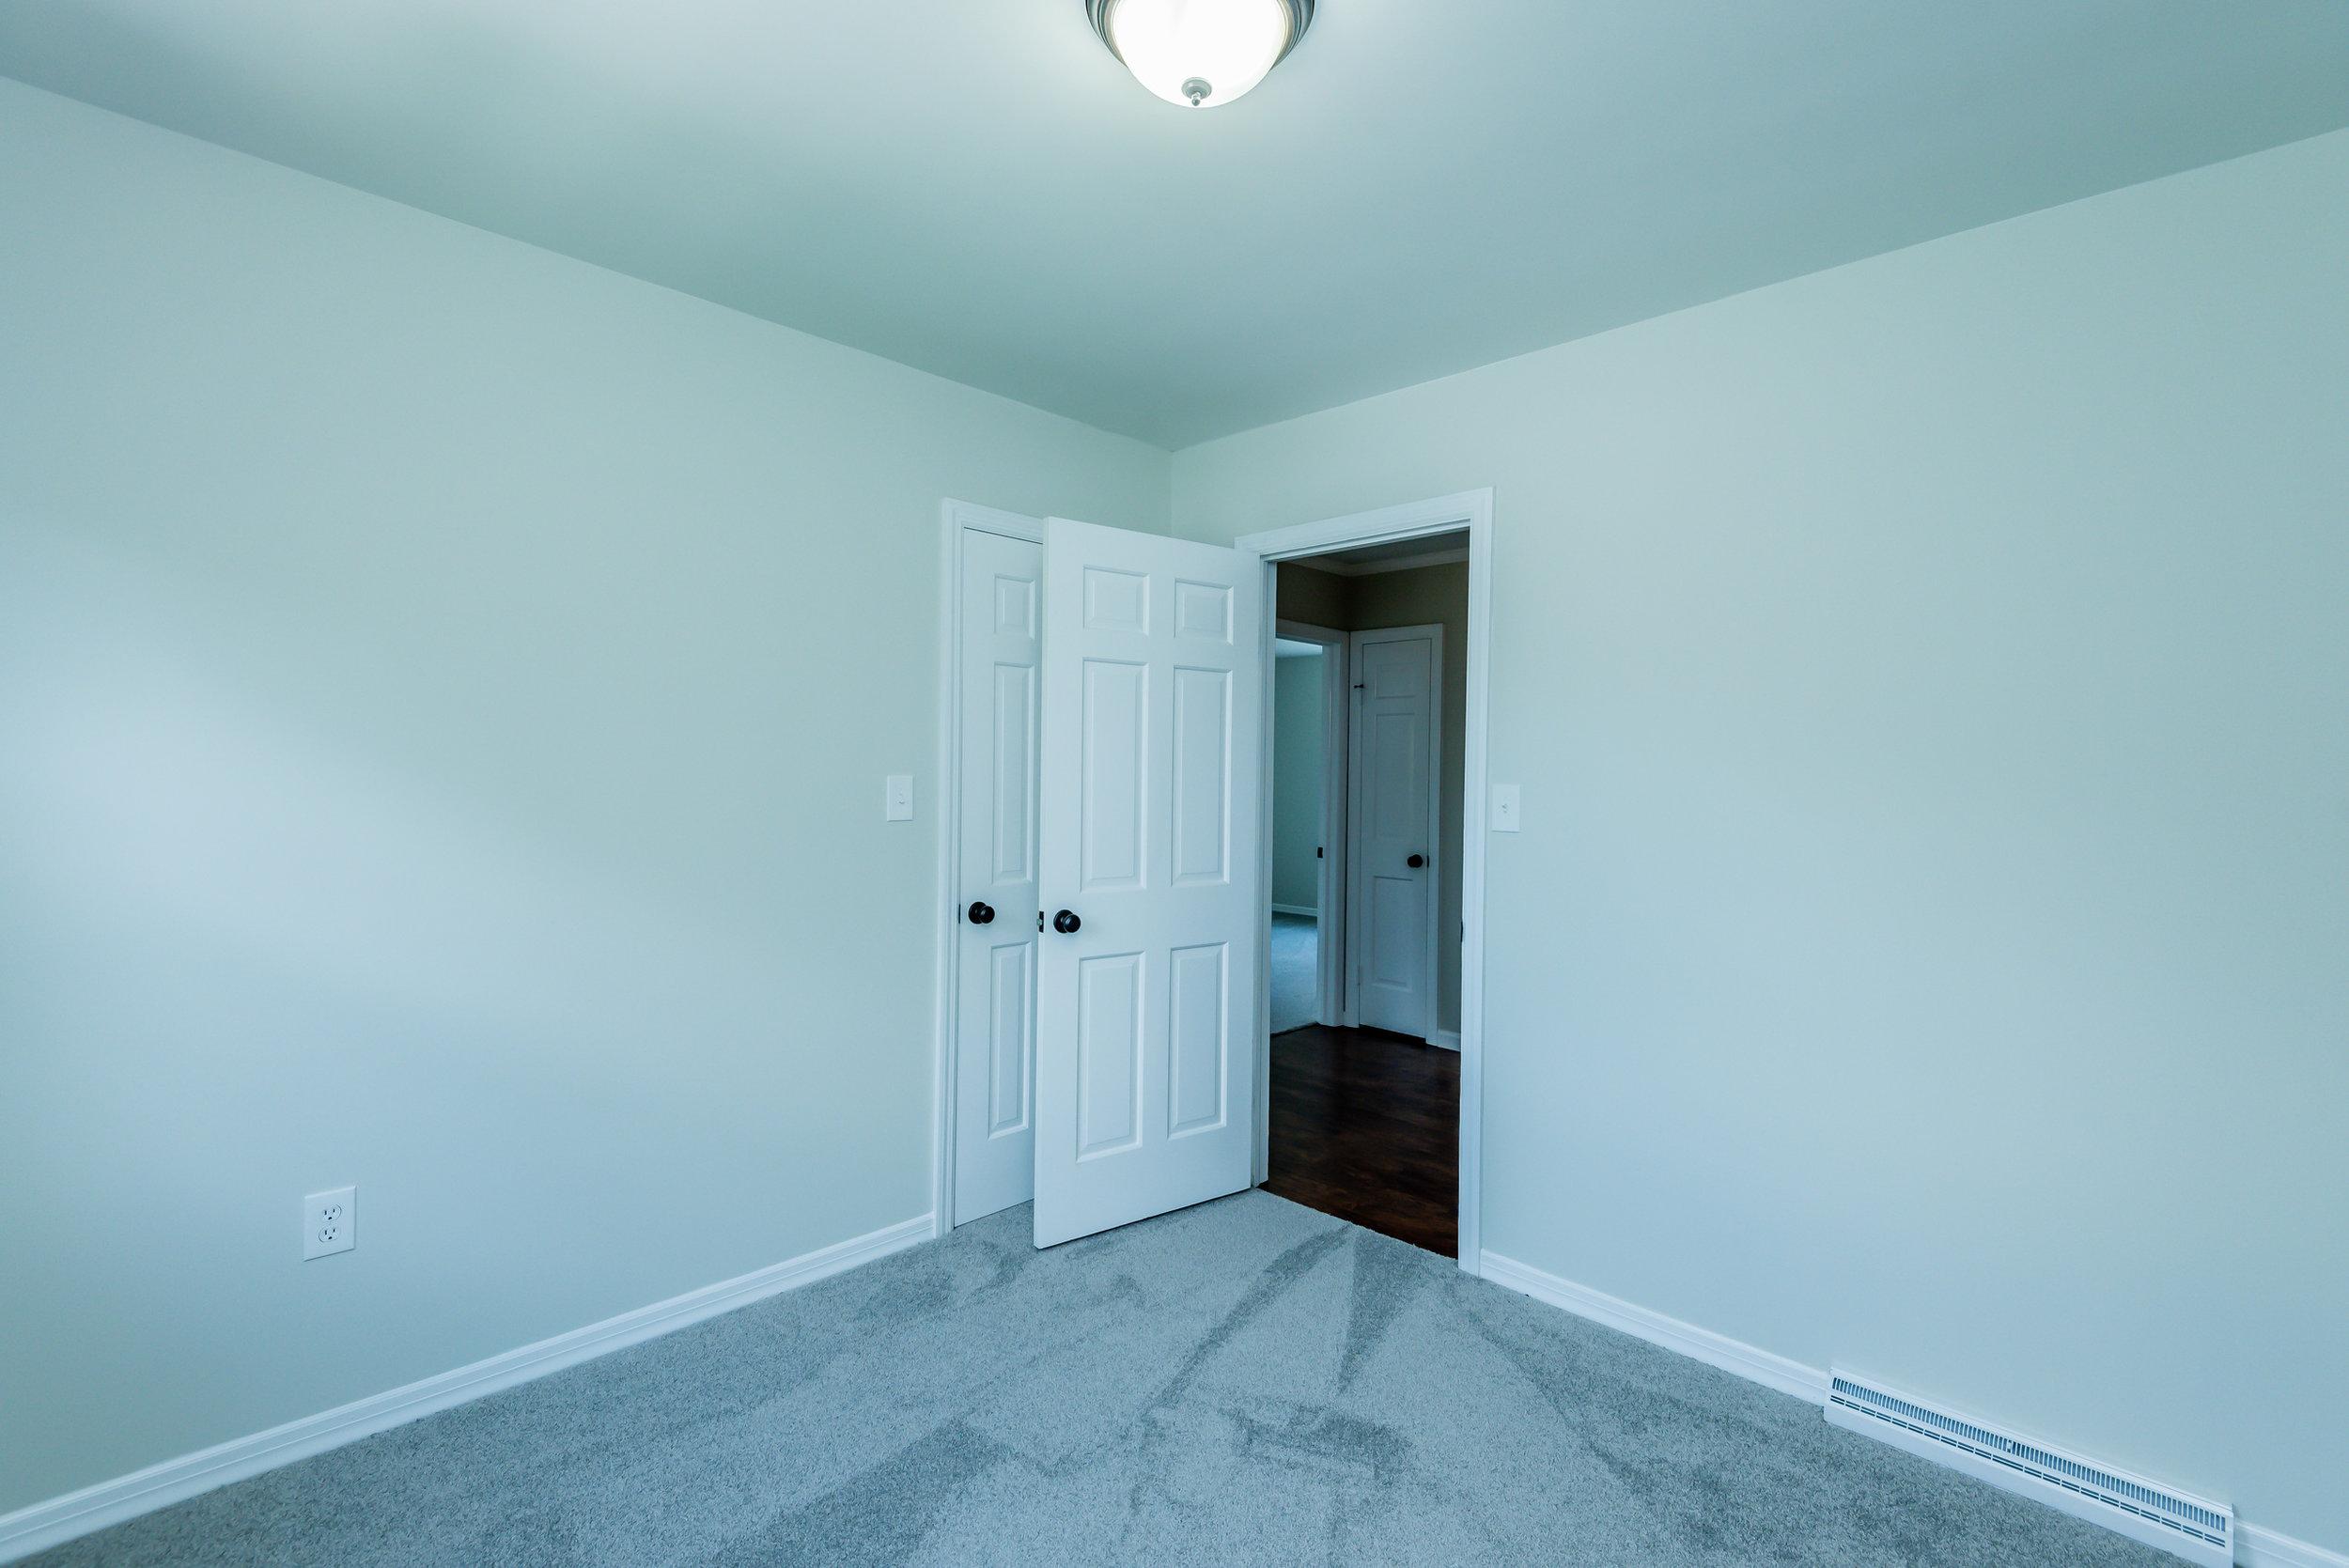 room_3_1_of_1_-2.jpg